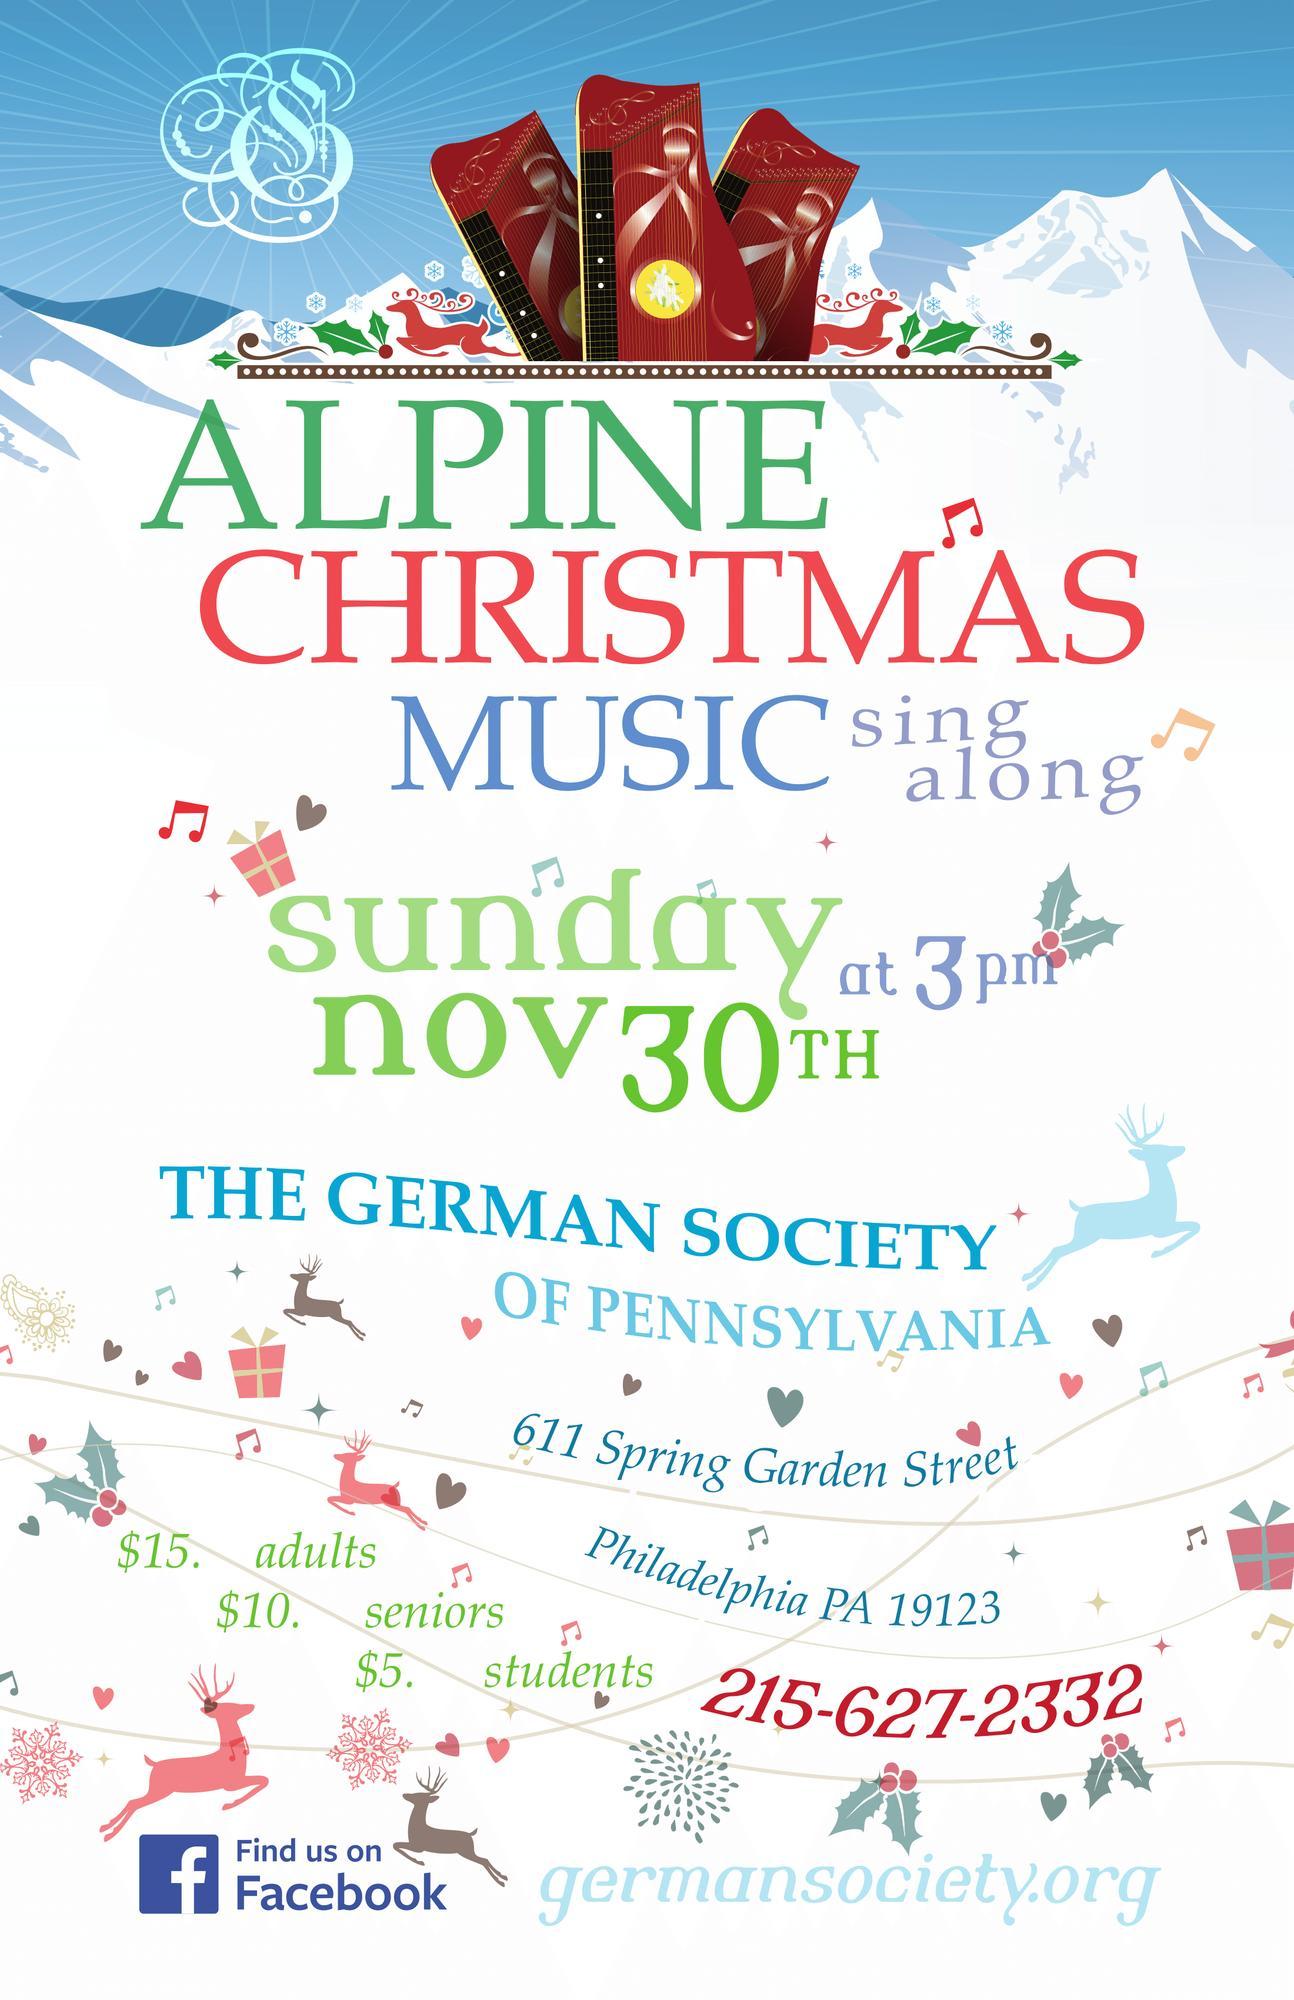 alpine christmas music concert - German Christmas Music